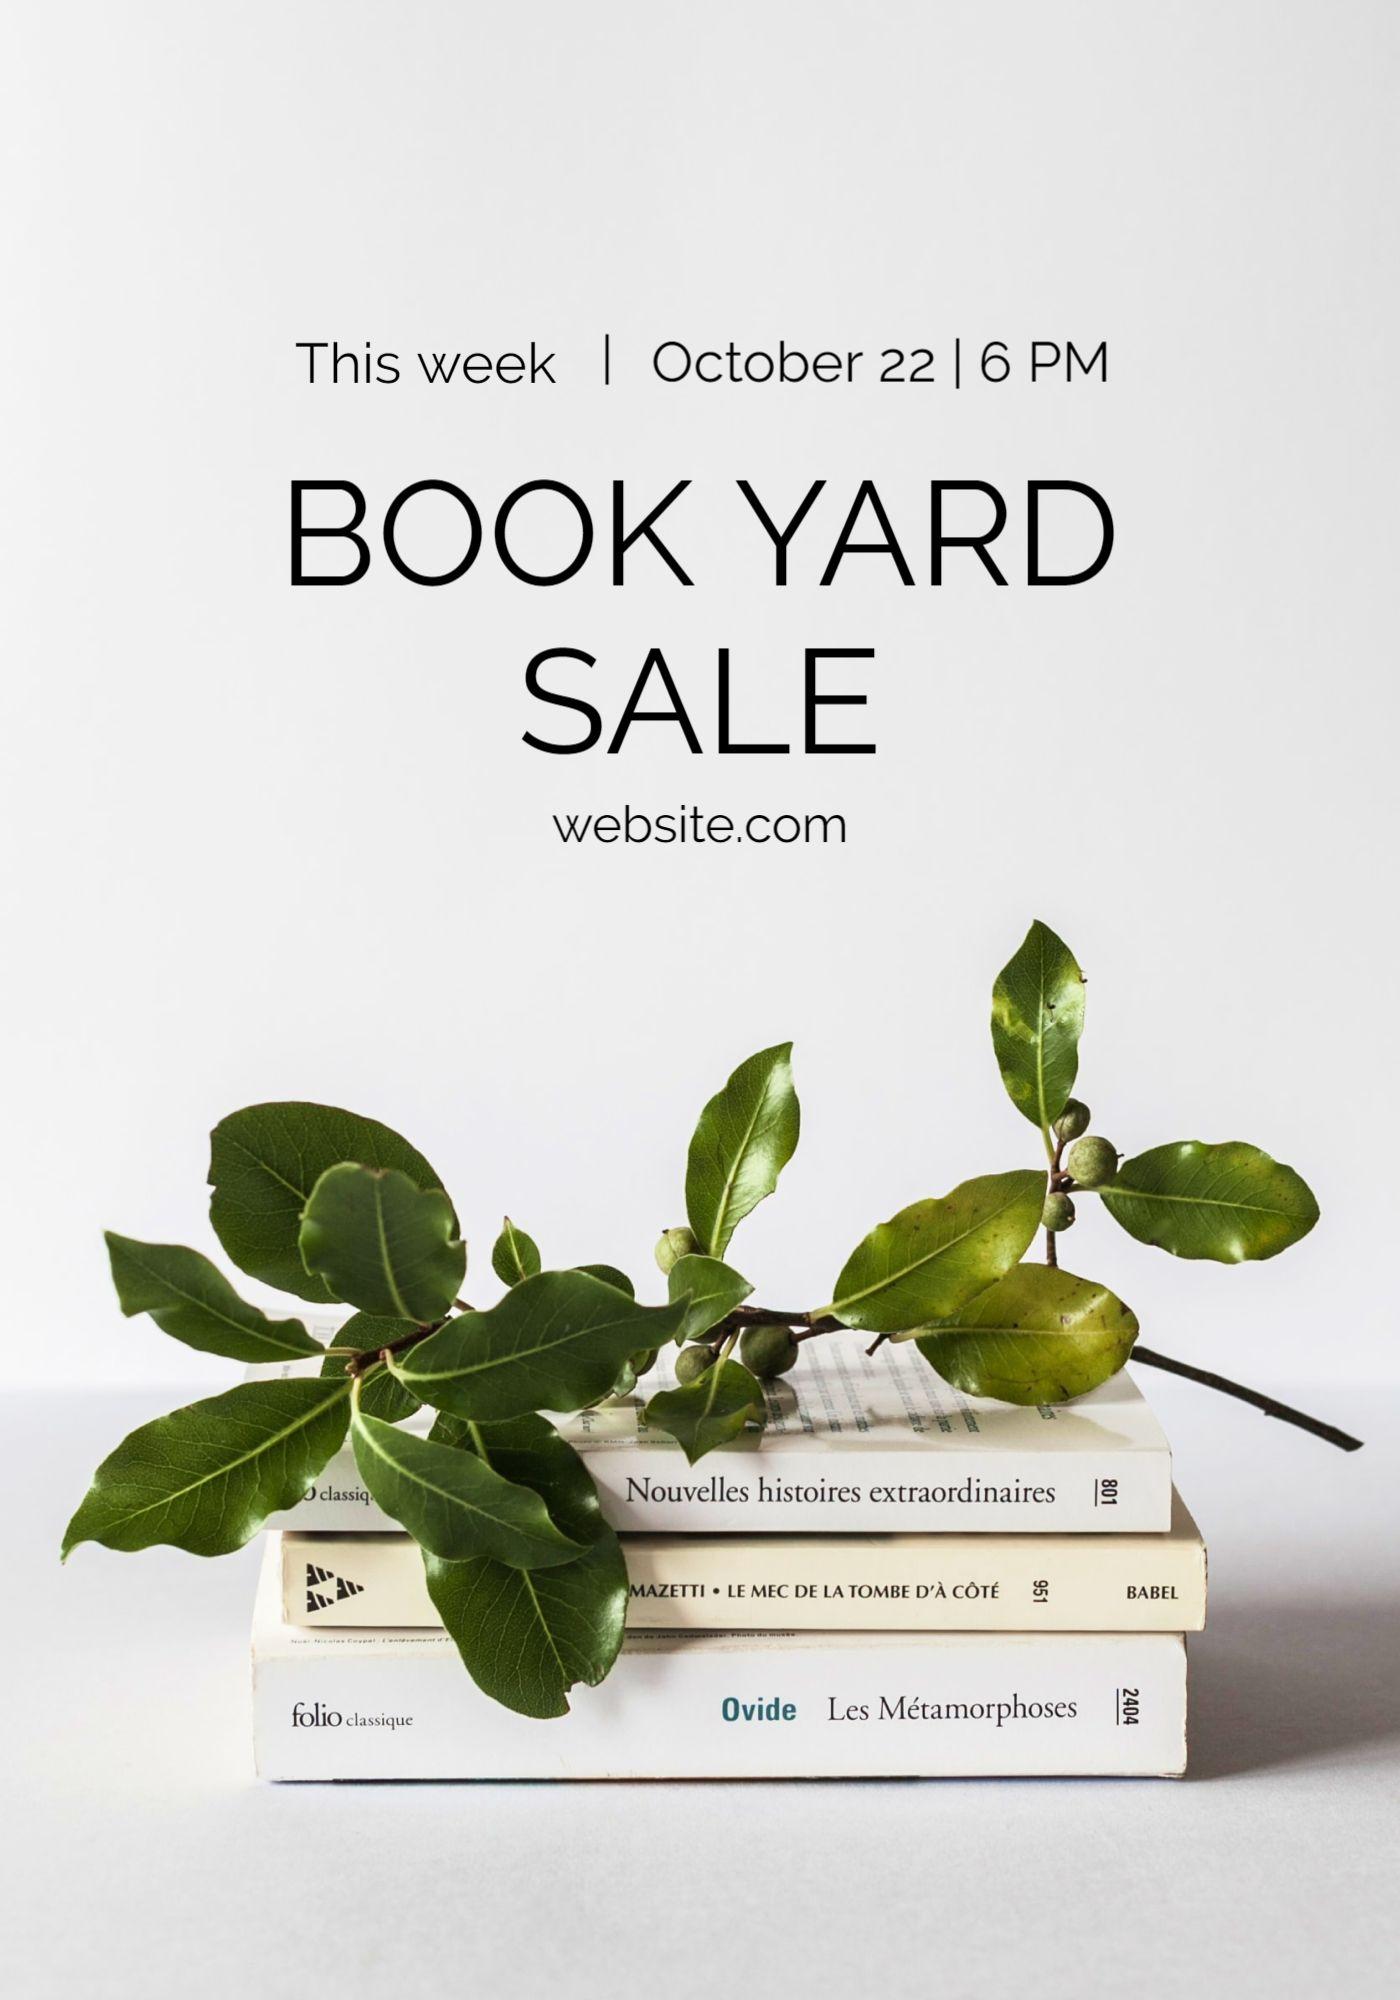 Book Yard Sale Flyer Template